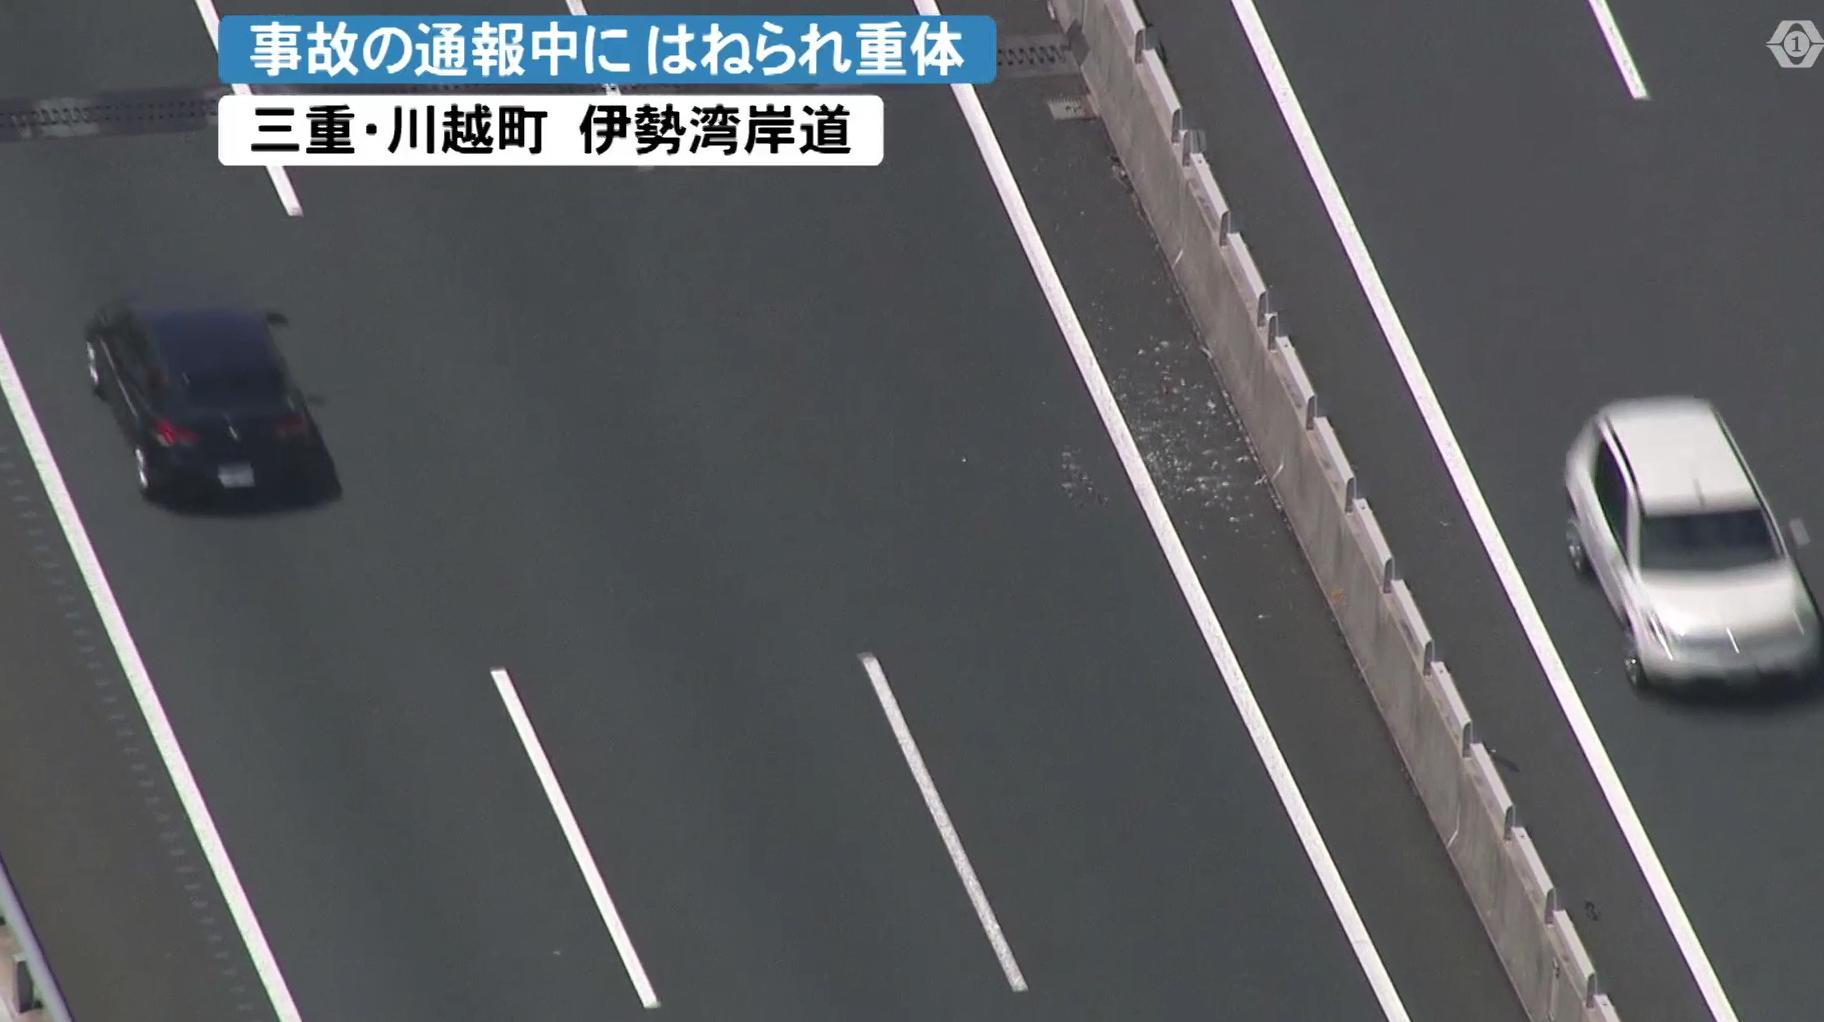 oikoshi_1.jpg